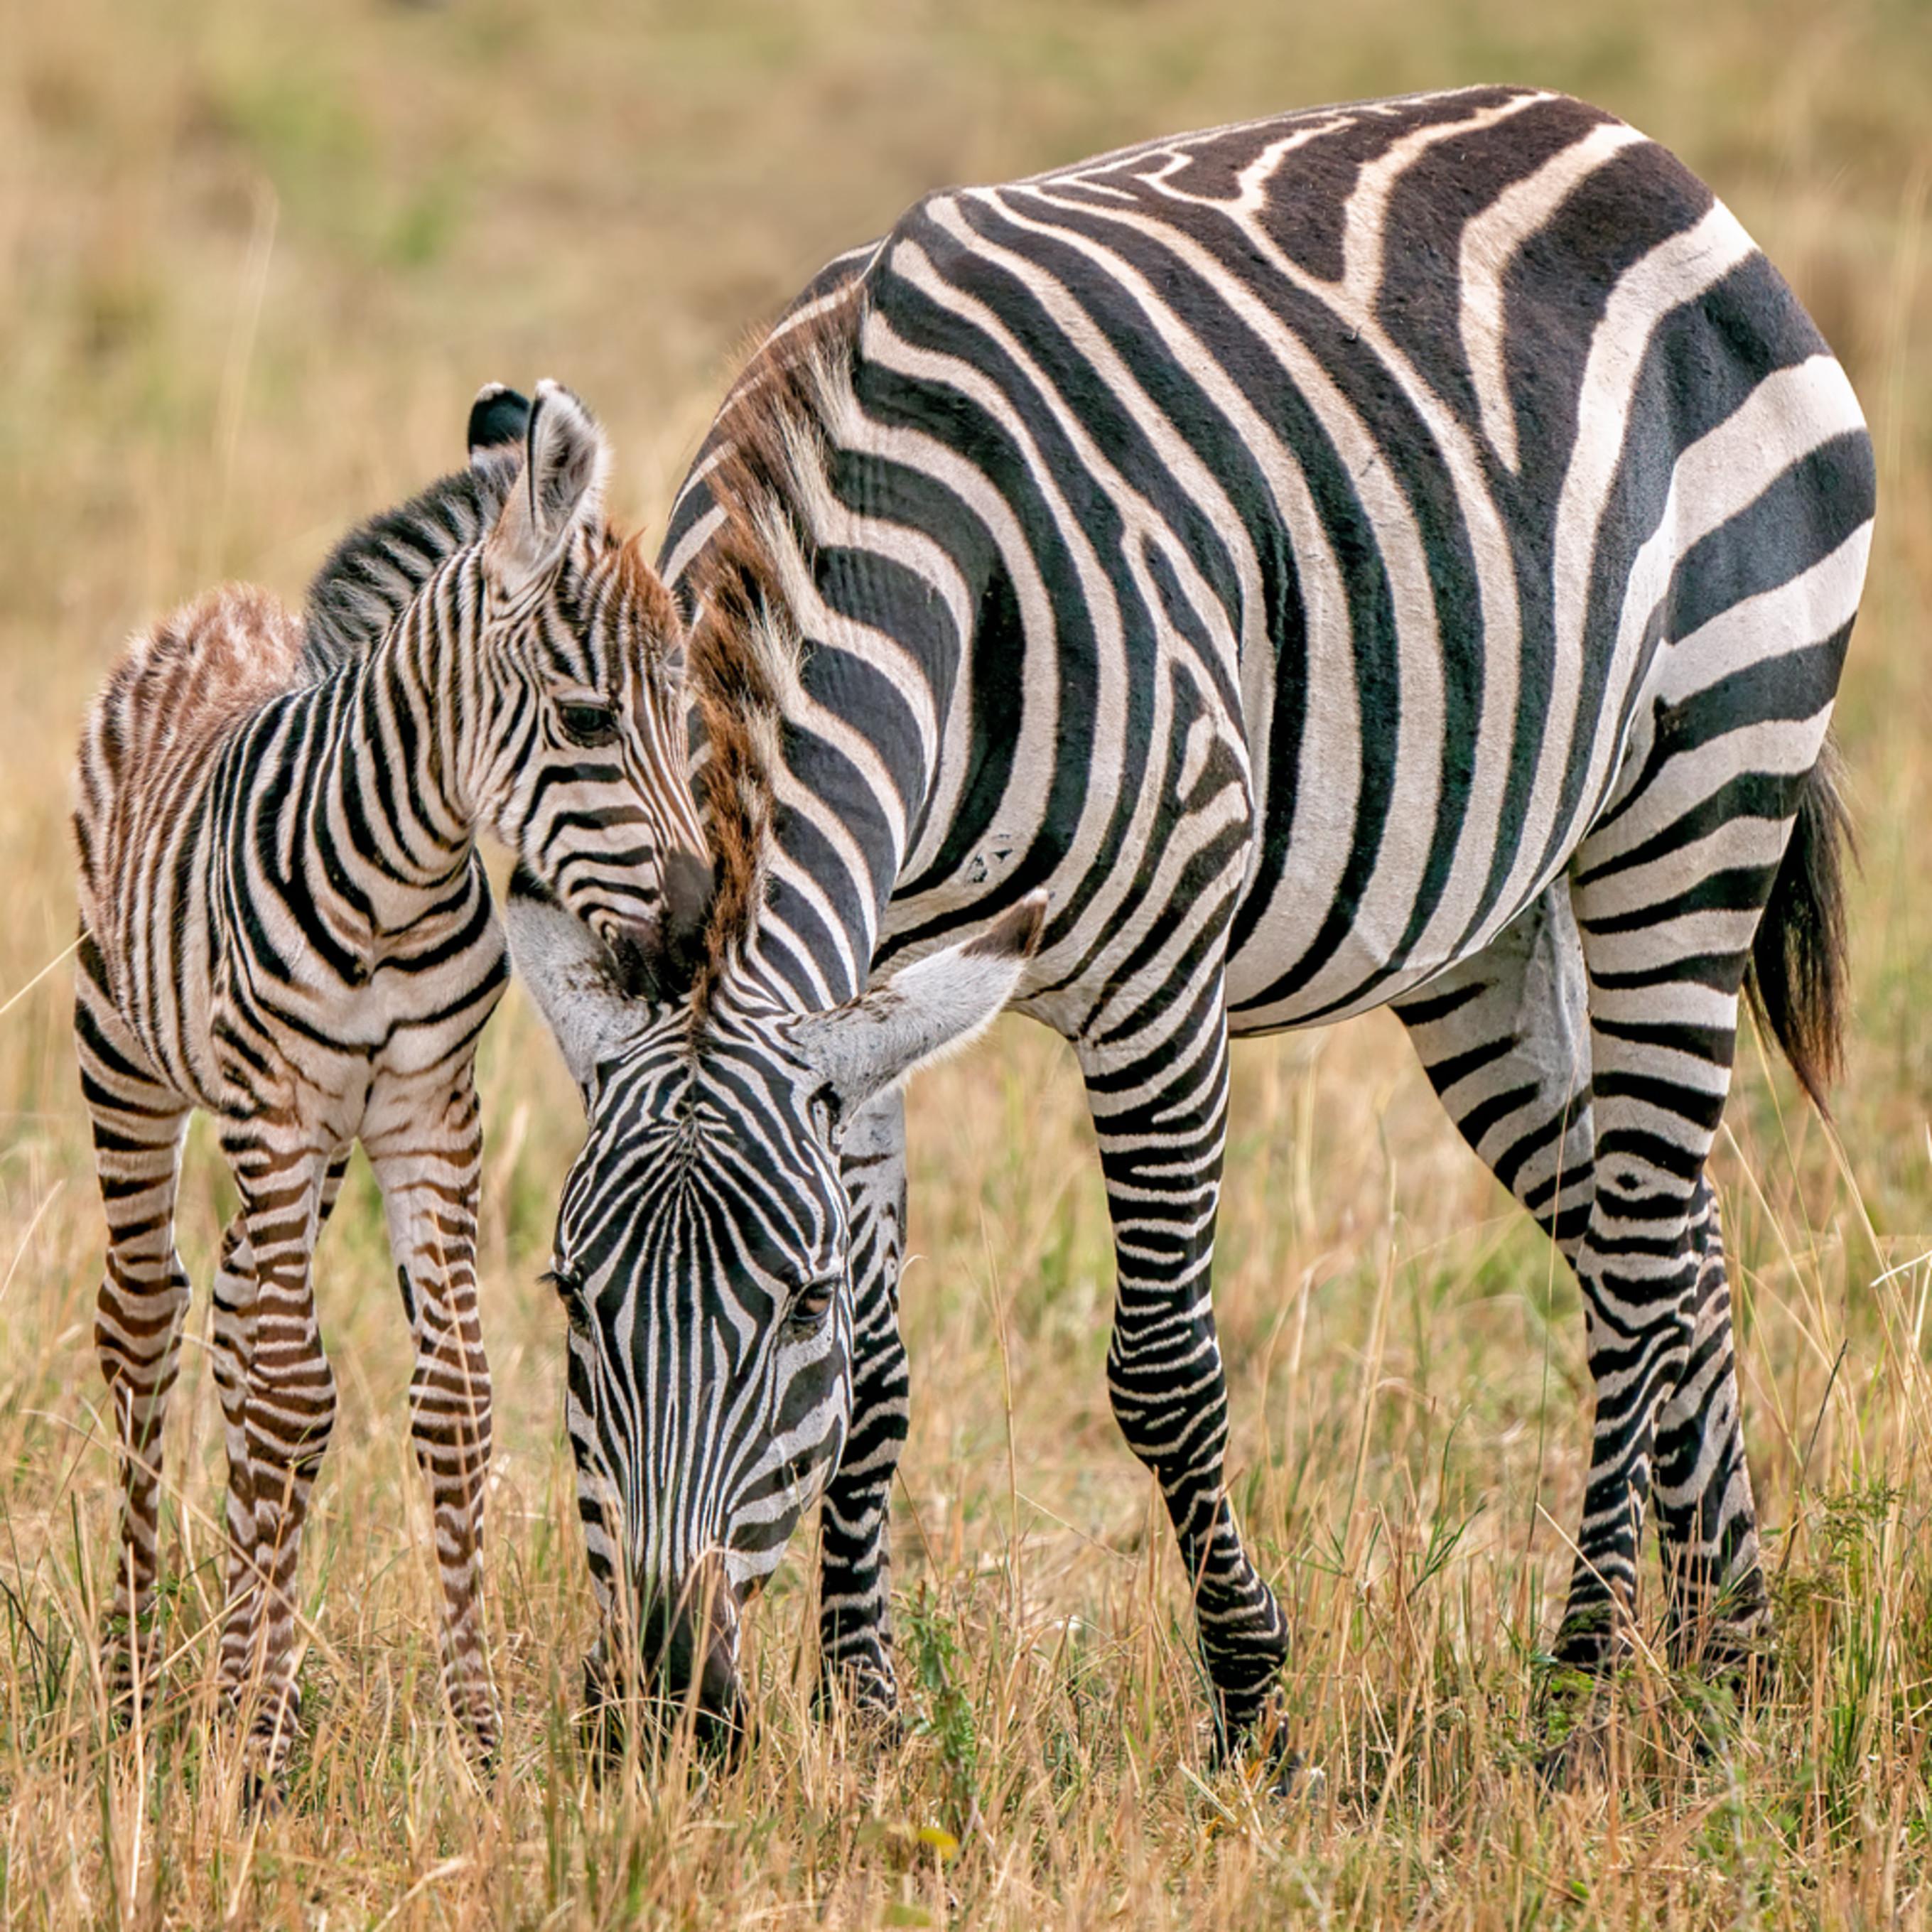 Stripes g3eoxy